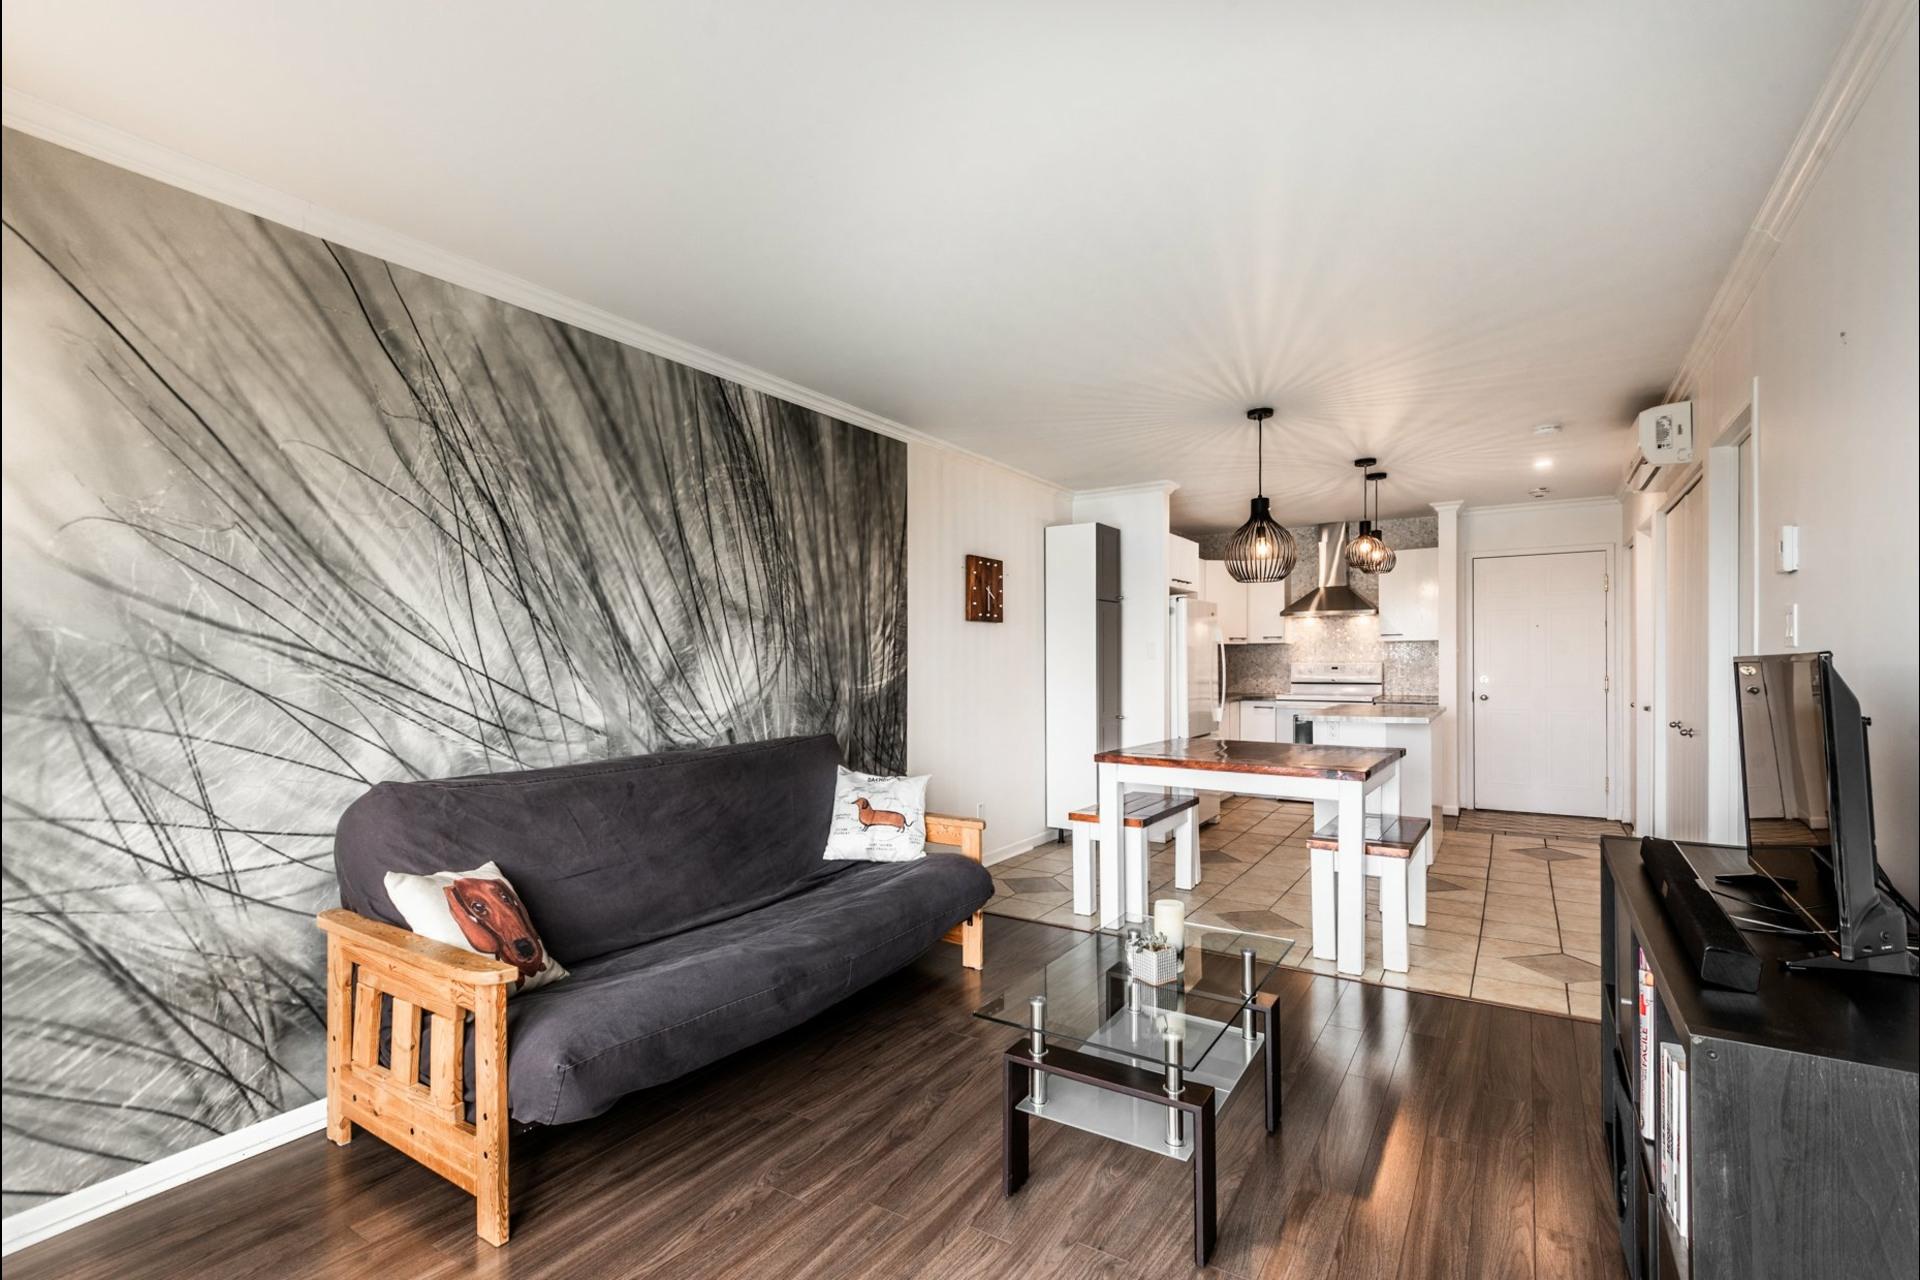 image 11 - Apartment For sale Saint-Hubert Longueuil  - 4 rooms